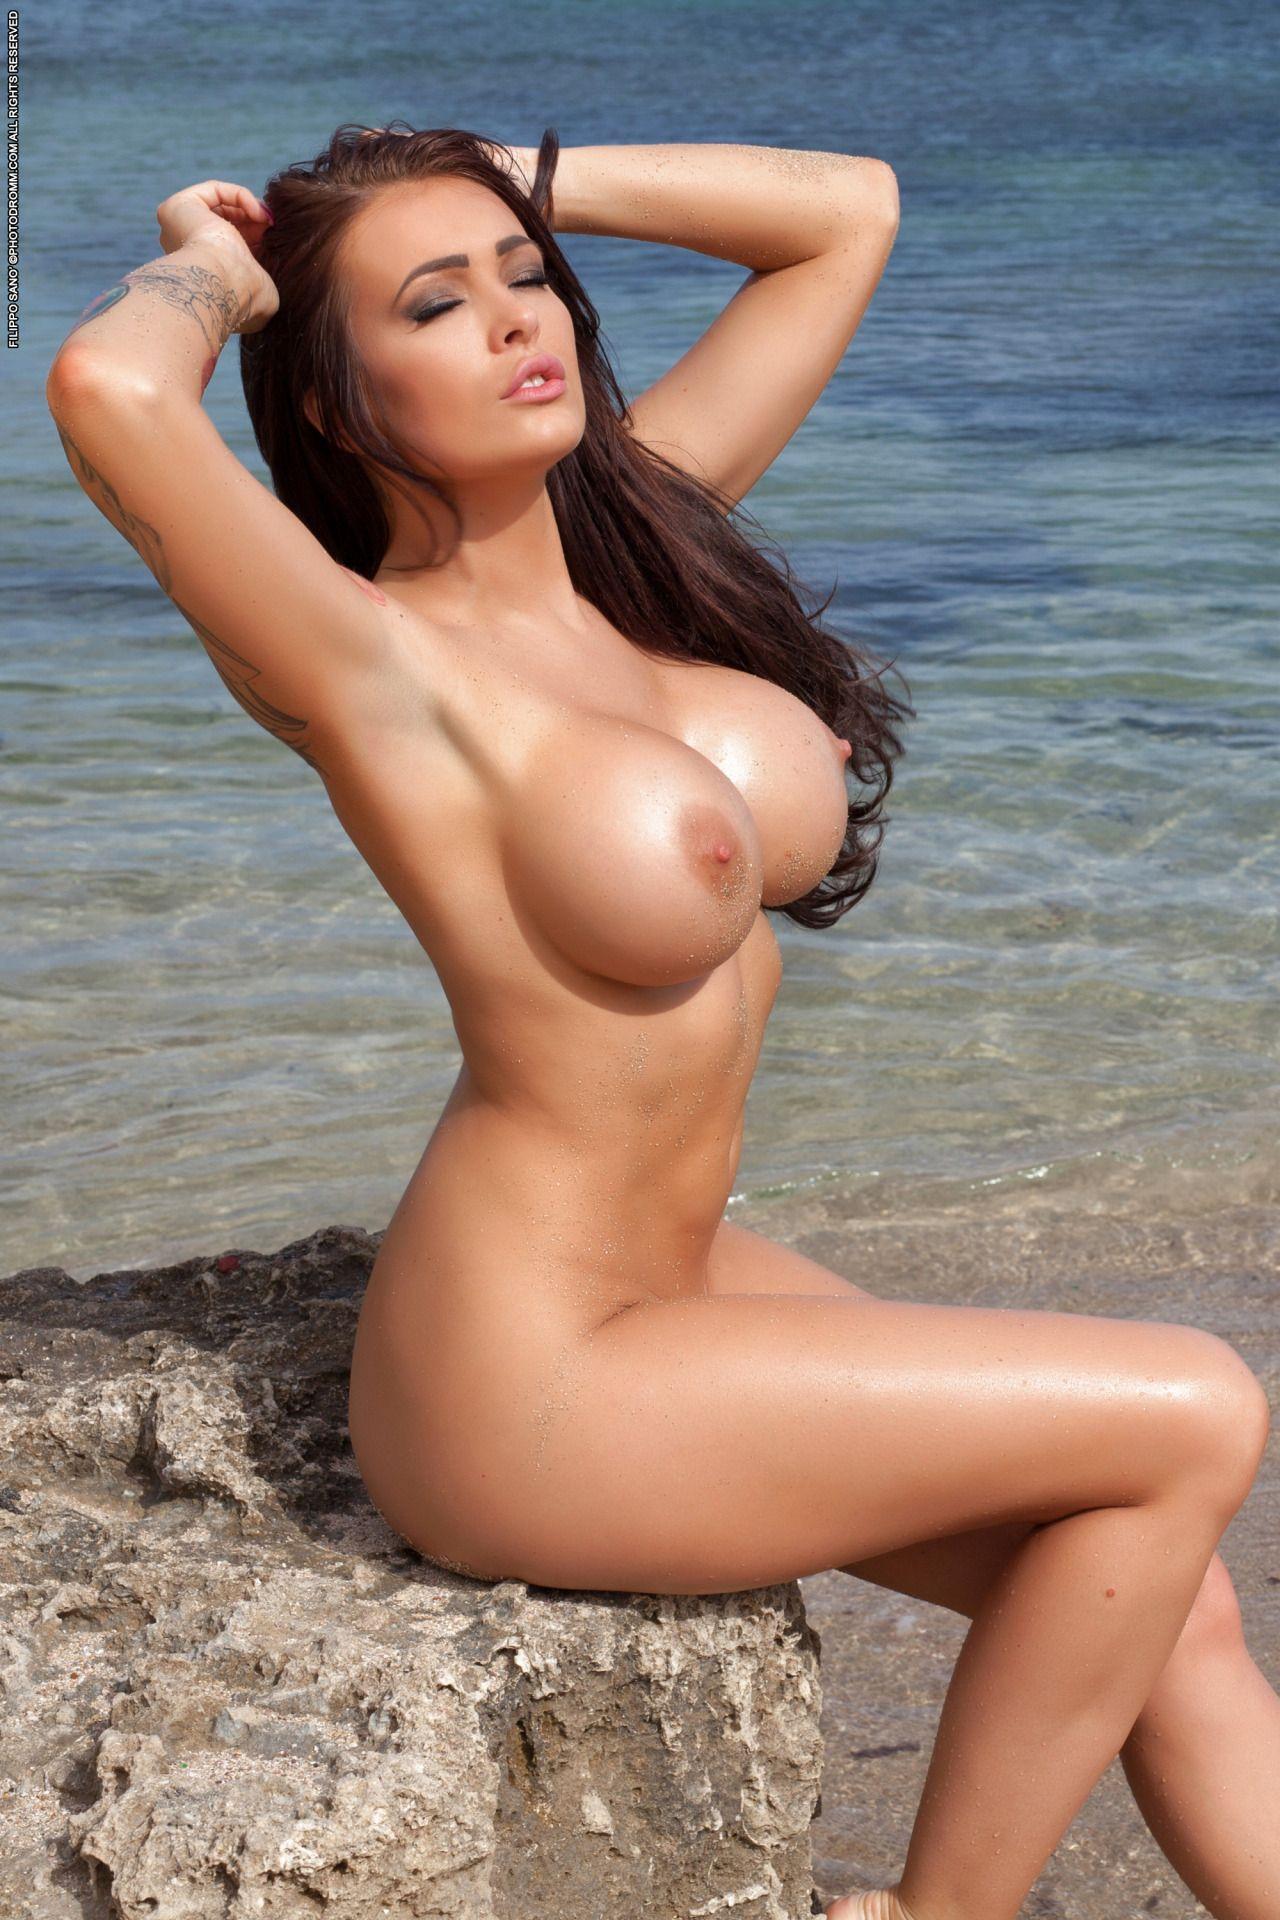 lucky-cute-nude-girl